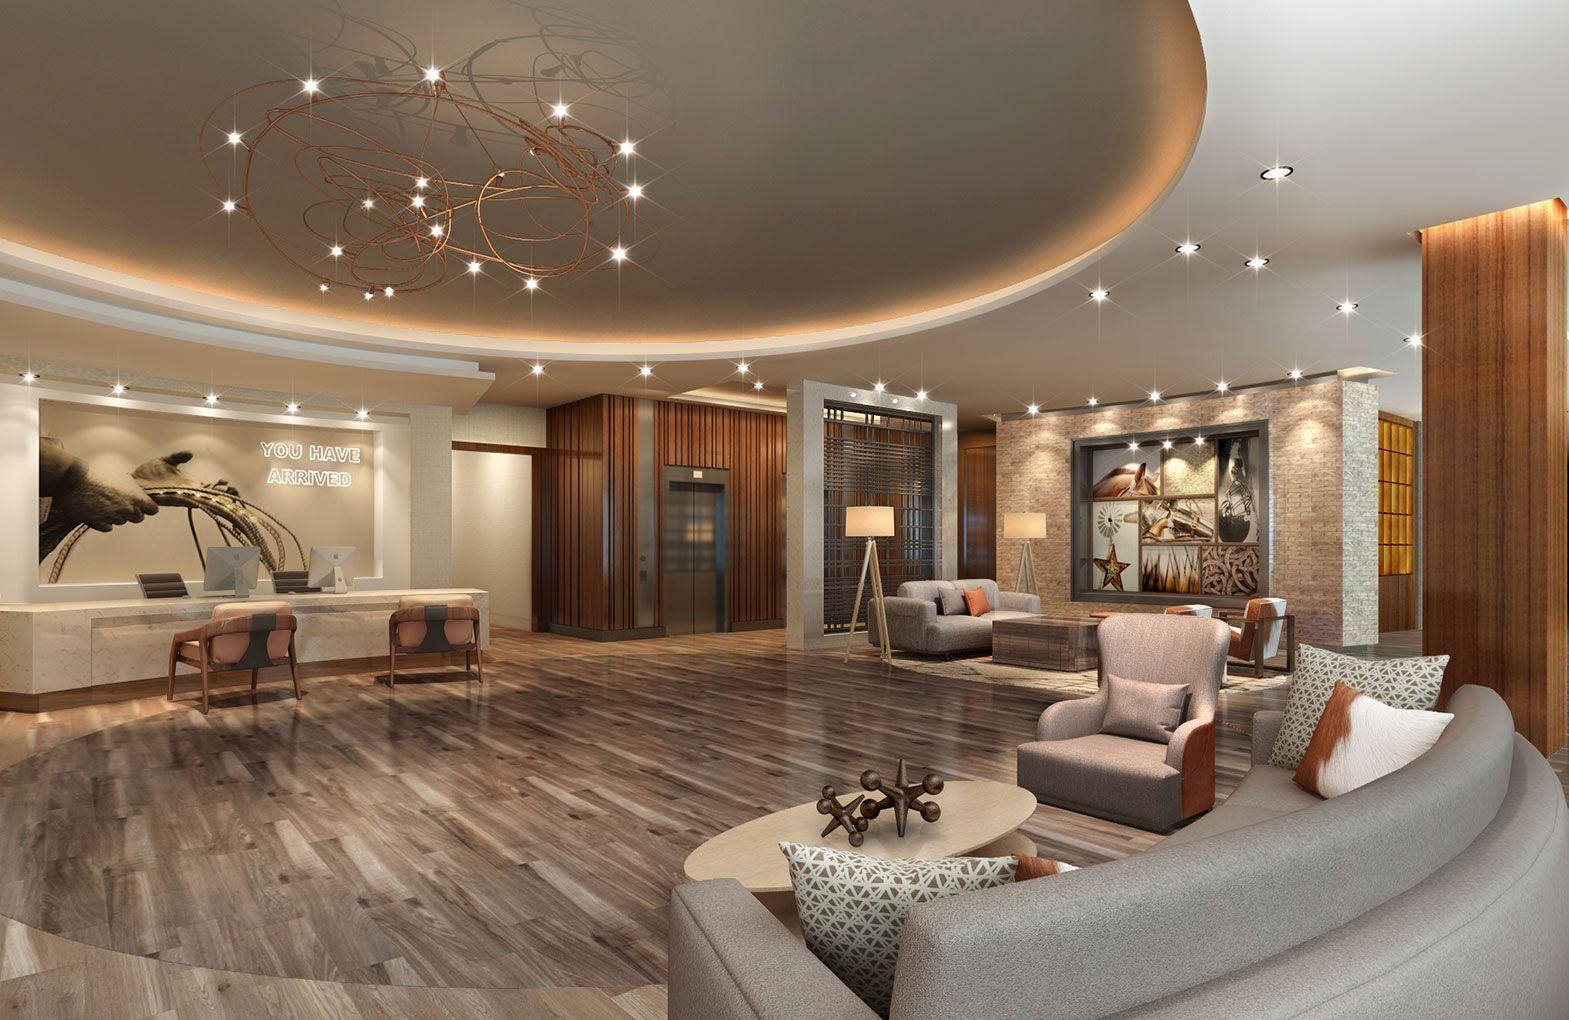 Cambria Southlake Texas Designed By Studio Hba The New Cambria